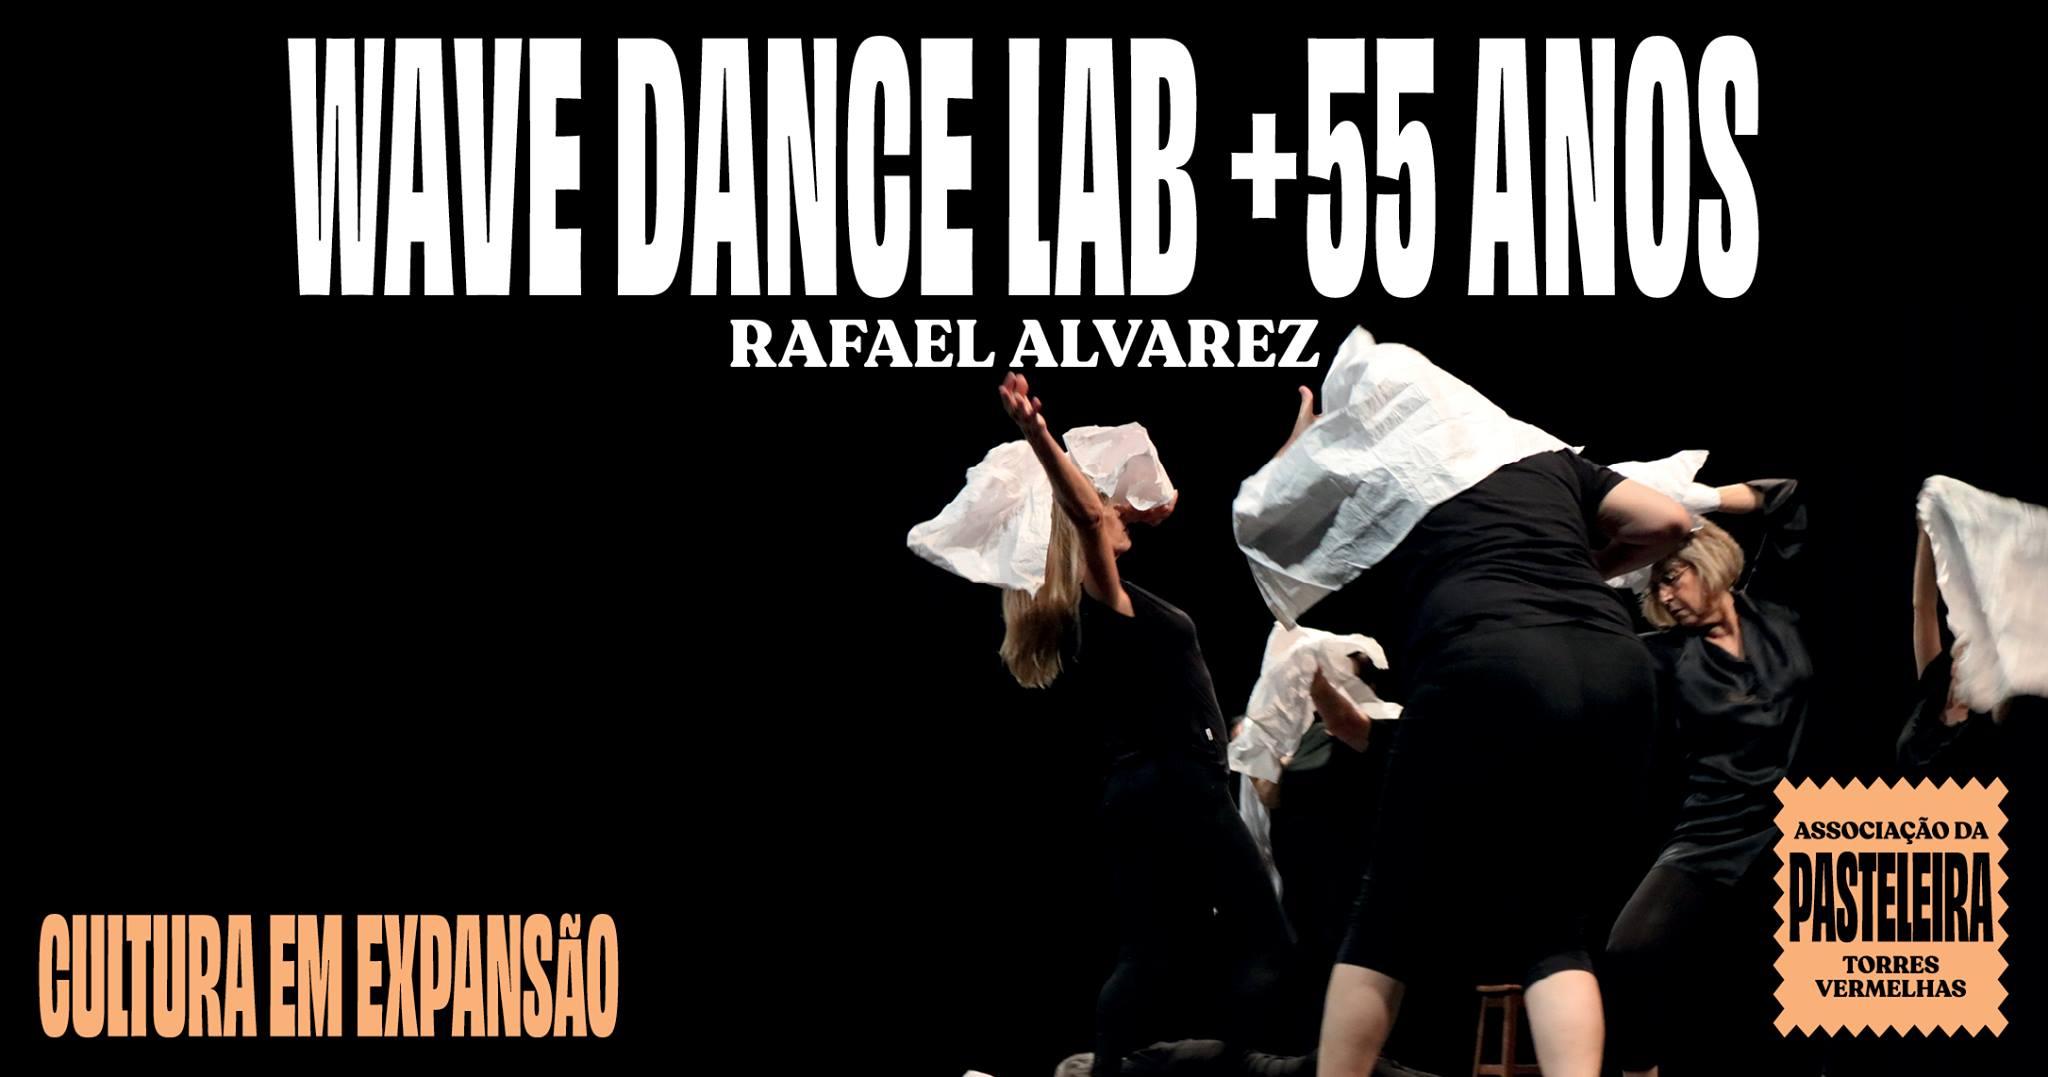 WAVE DANCE LAB +55 ANOS | RAFAEL ALVAREZ